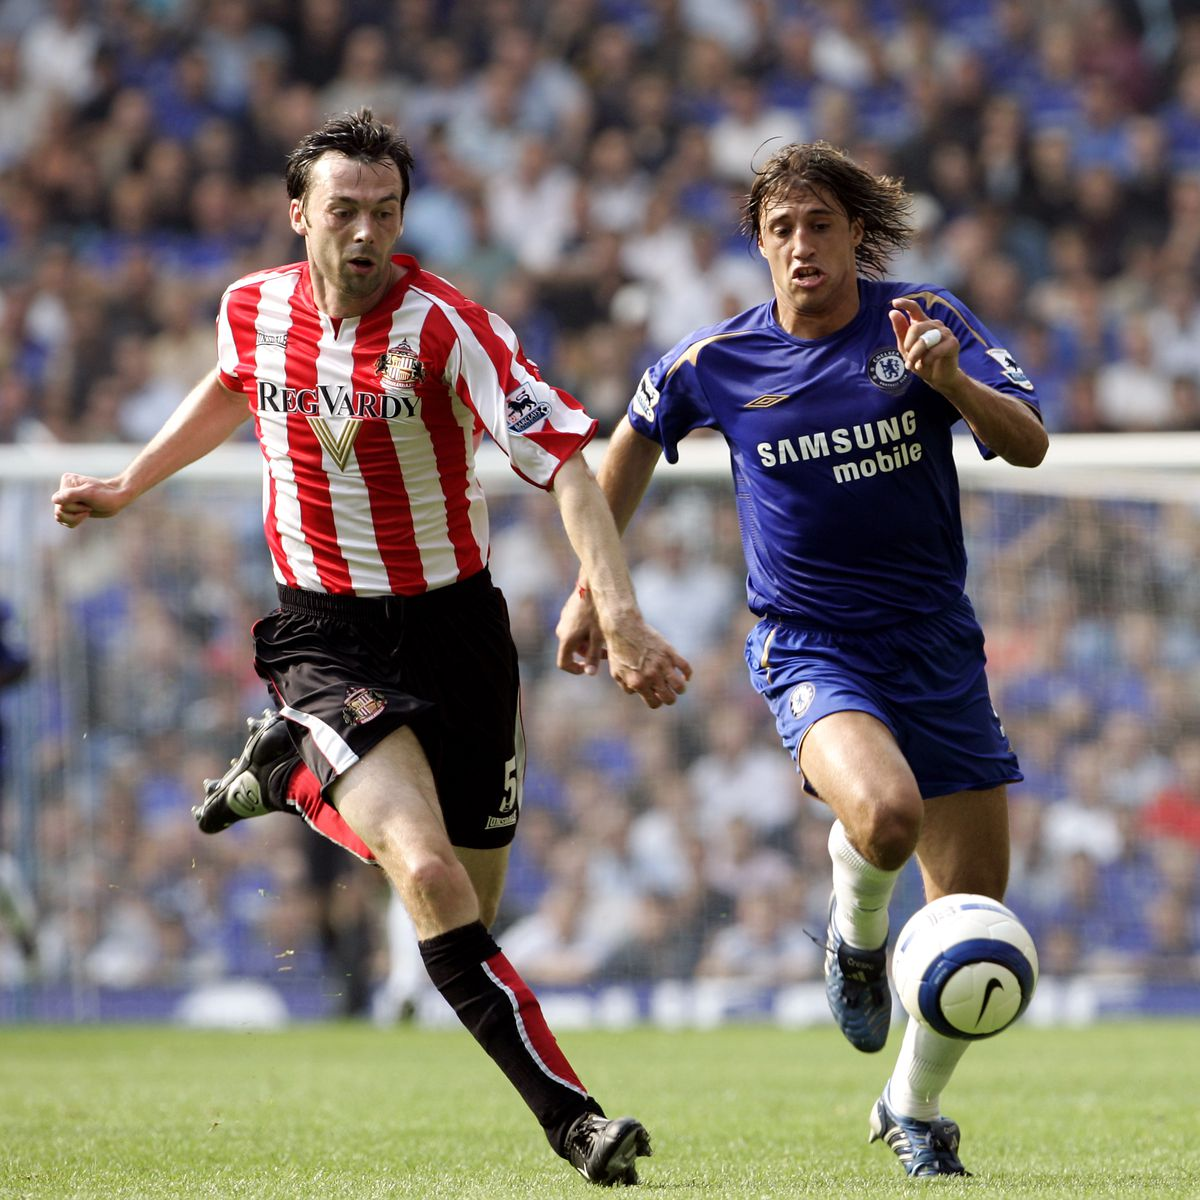 Soccer - FA Barclays Premiership - Chelsea v Sunderland - Stamford Bridge